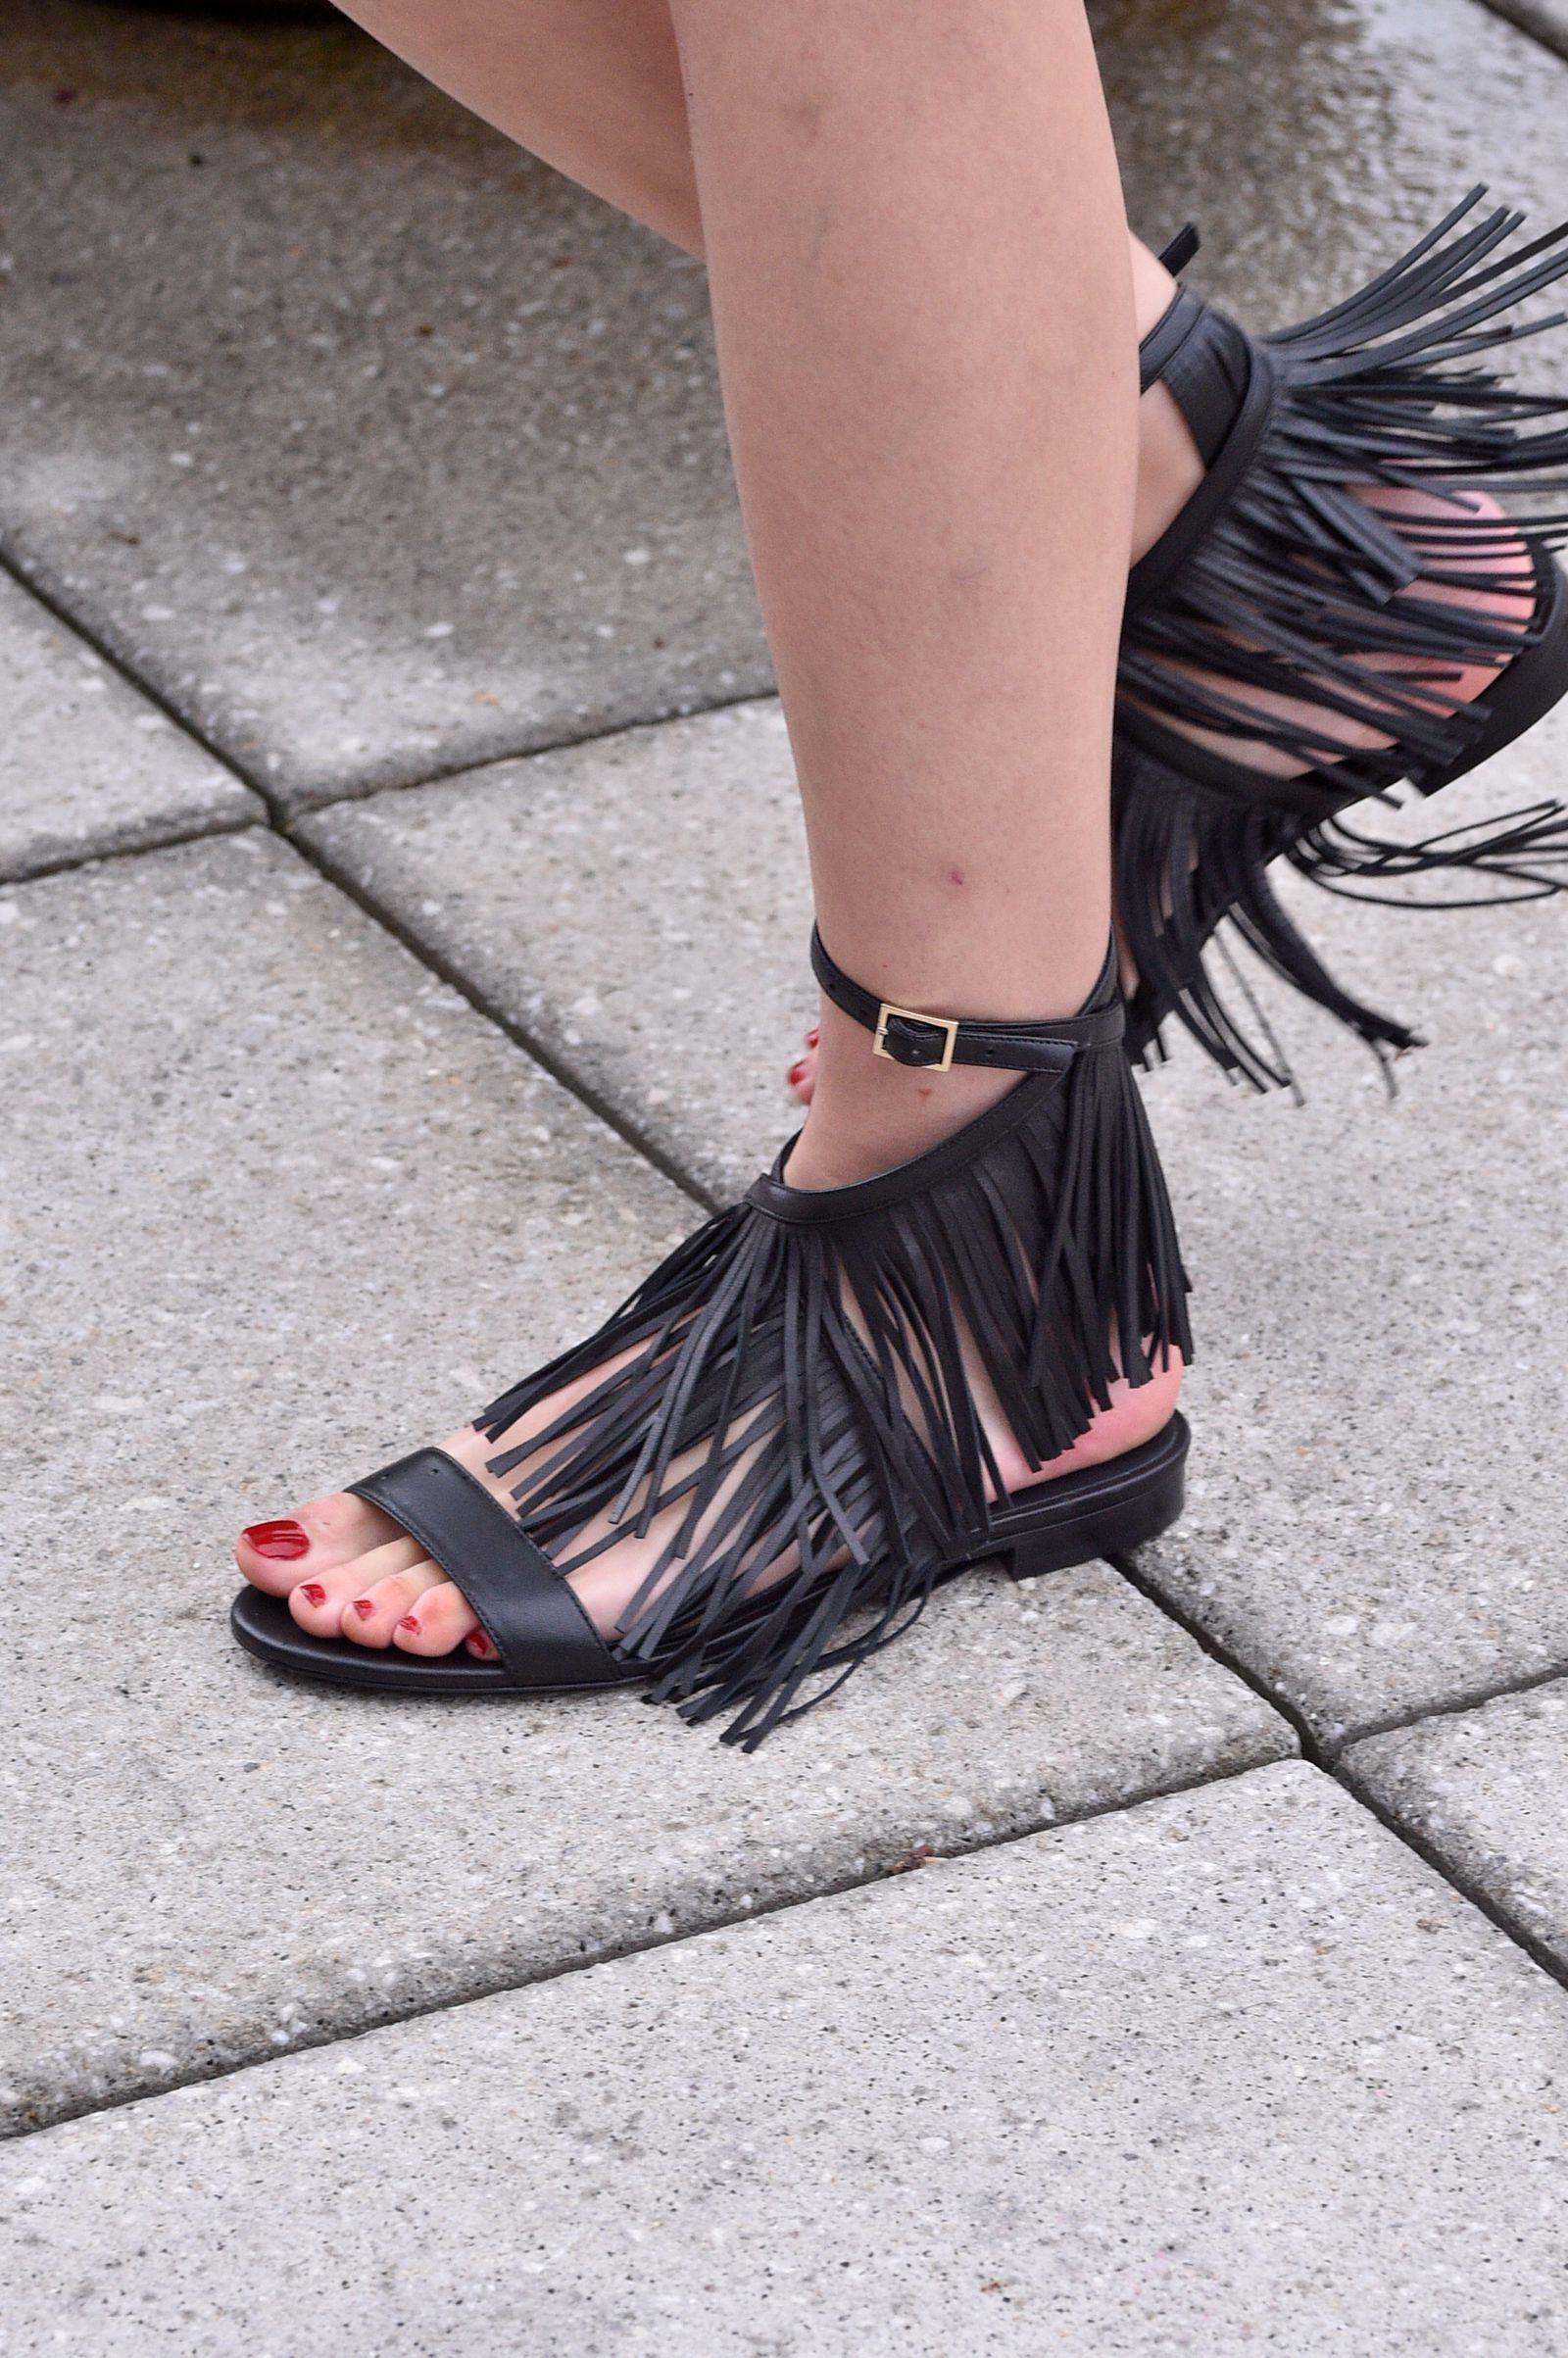 Best York Fashion The Runways Down Week Shoes New Walking 1dxda4wq